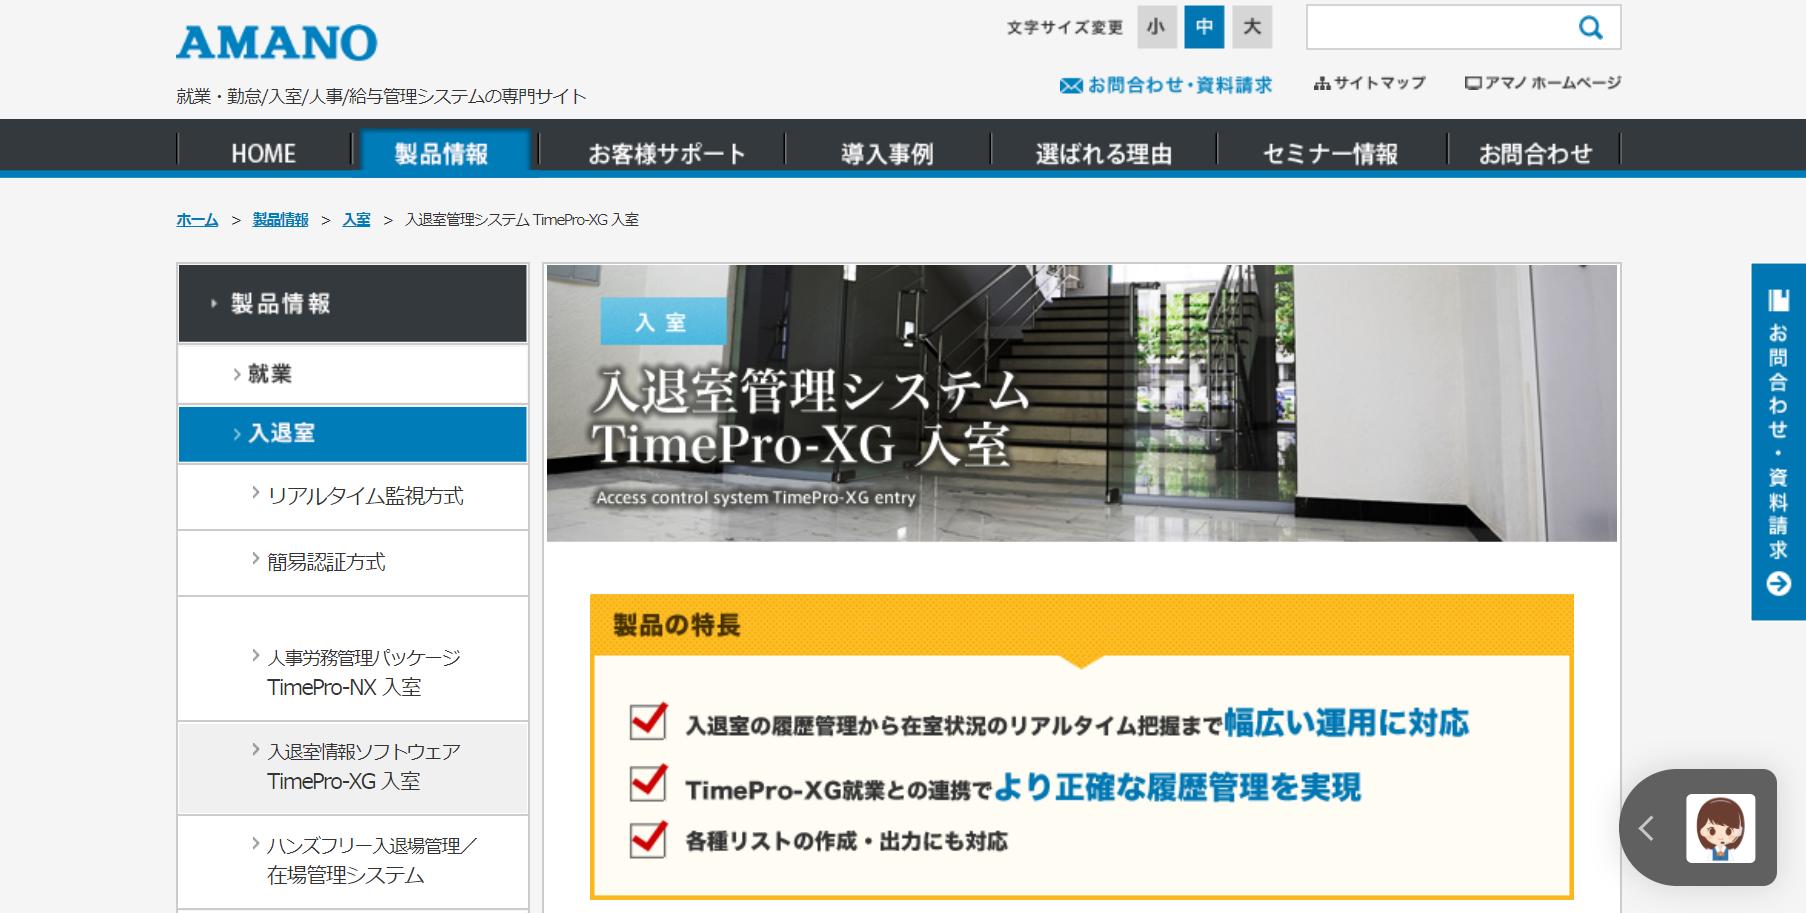 TimePro-XG 入室